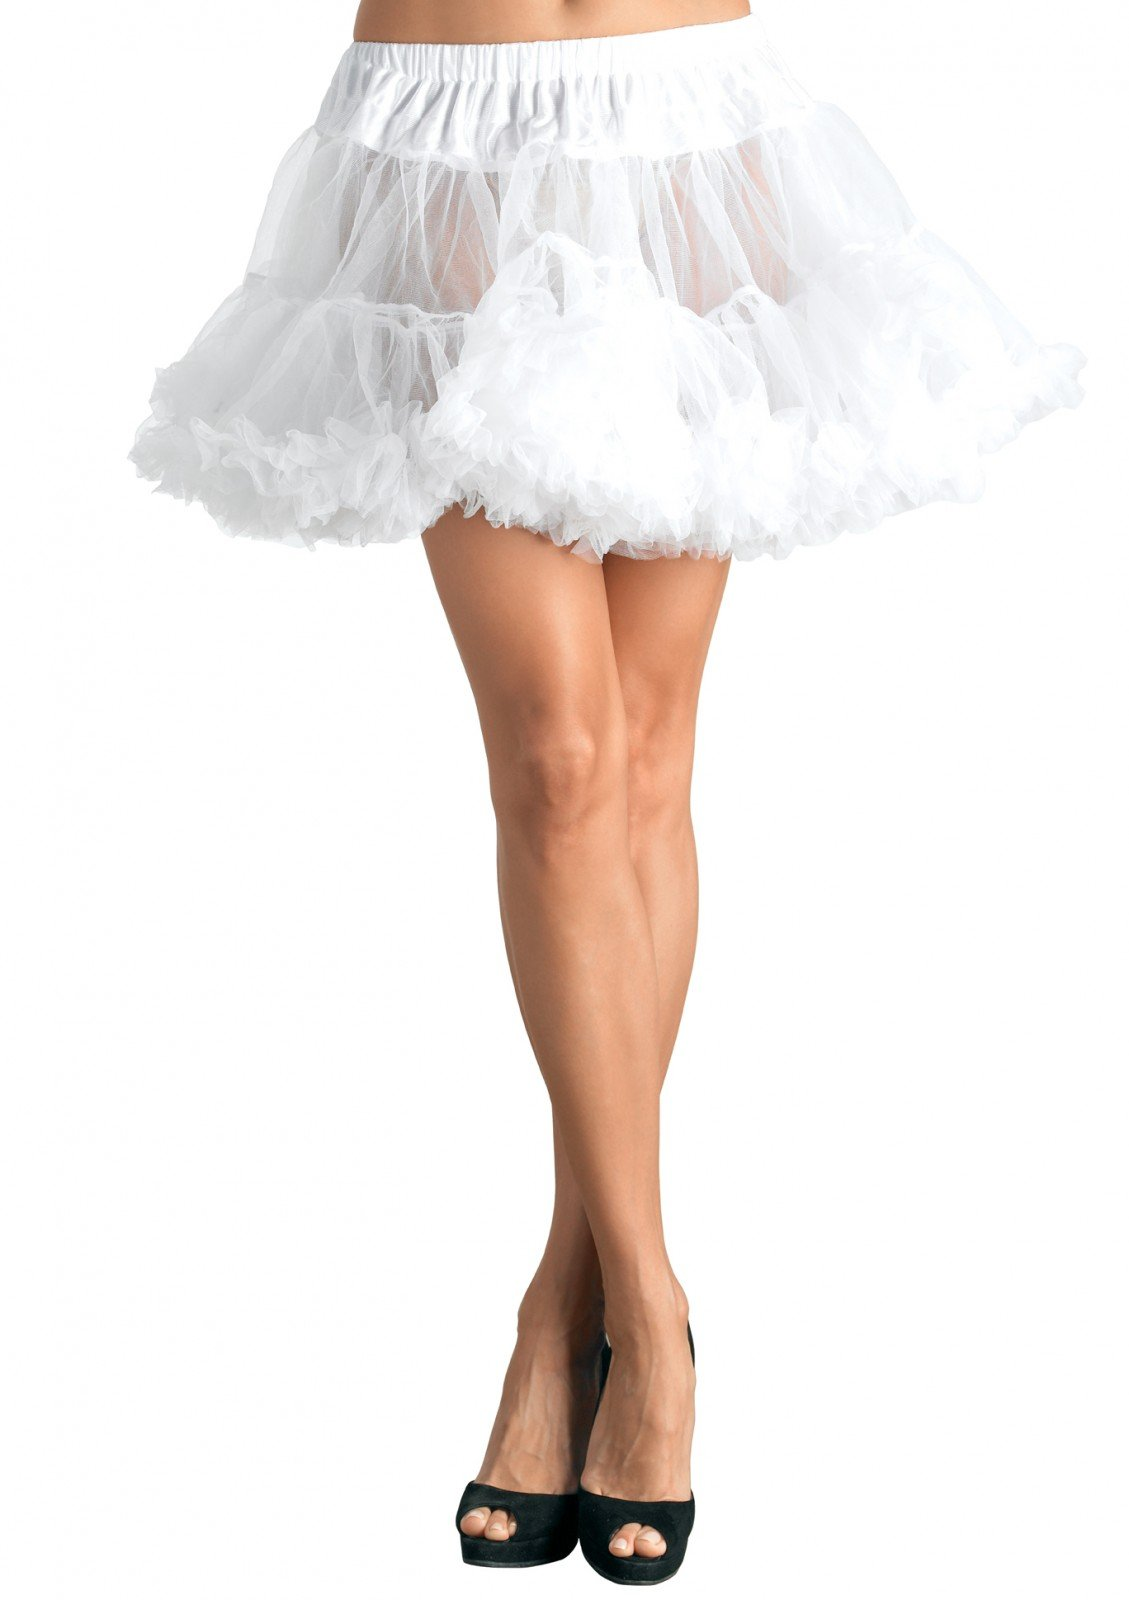 Leg Avenue Women's Petticoat Dress, White, One Size